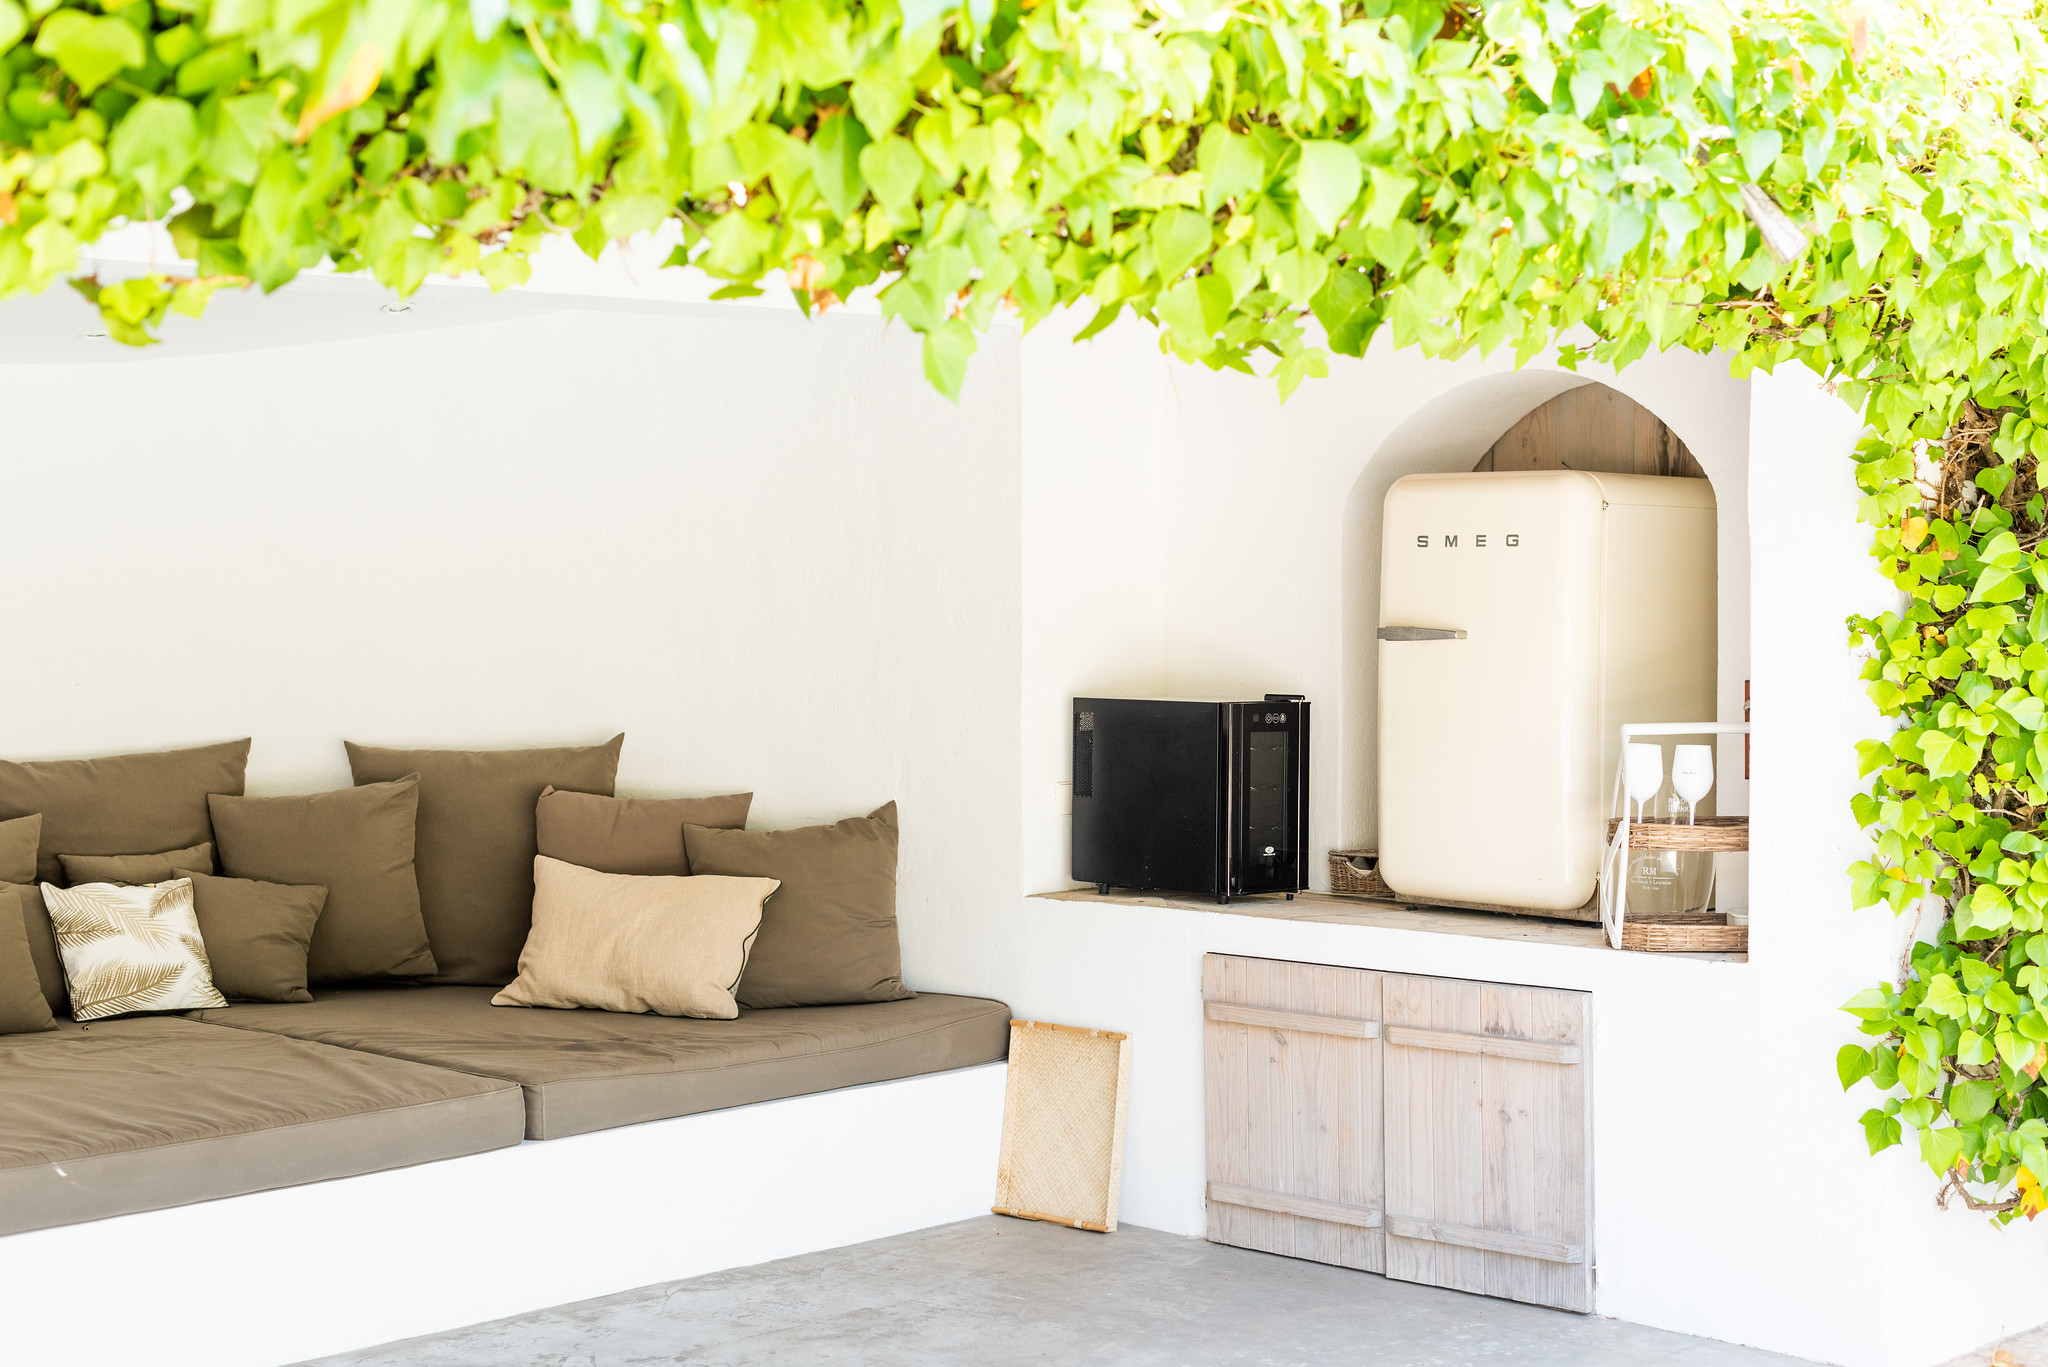 https://www.white-ibiza.com/wp-content/uploads/2020/05/white-ibiza-villas-can-riviere-exterior-outside-fridge.jpg